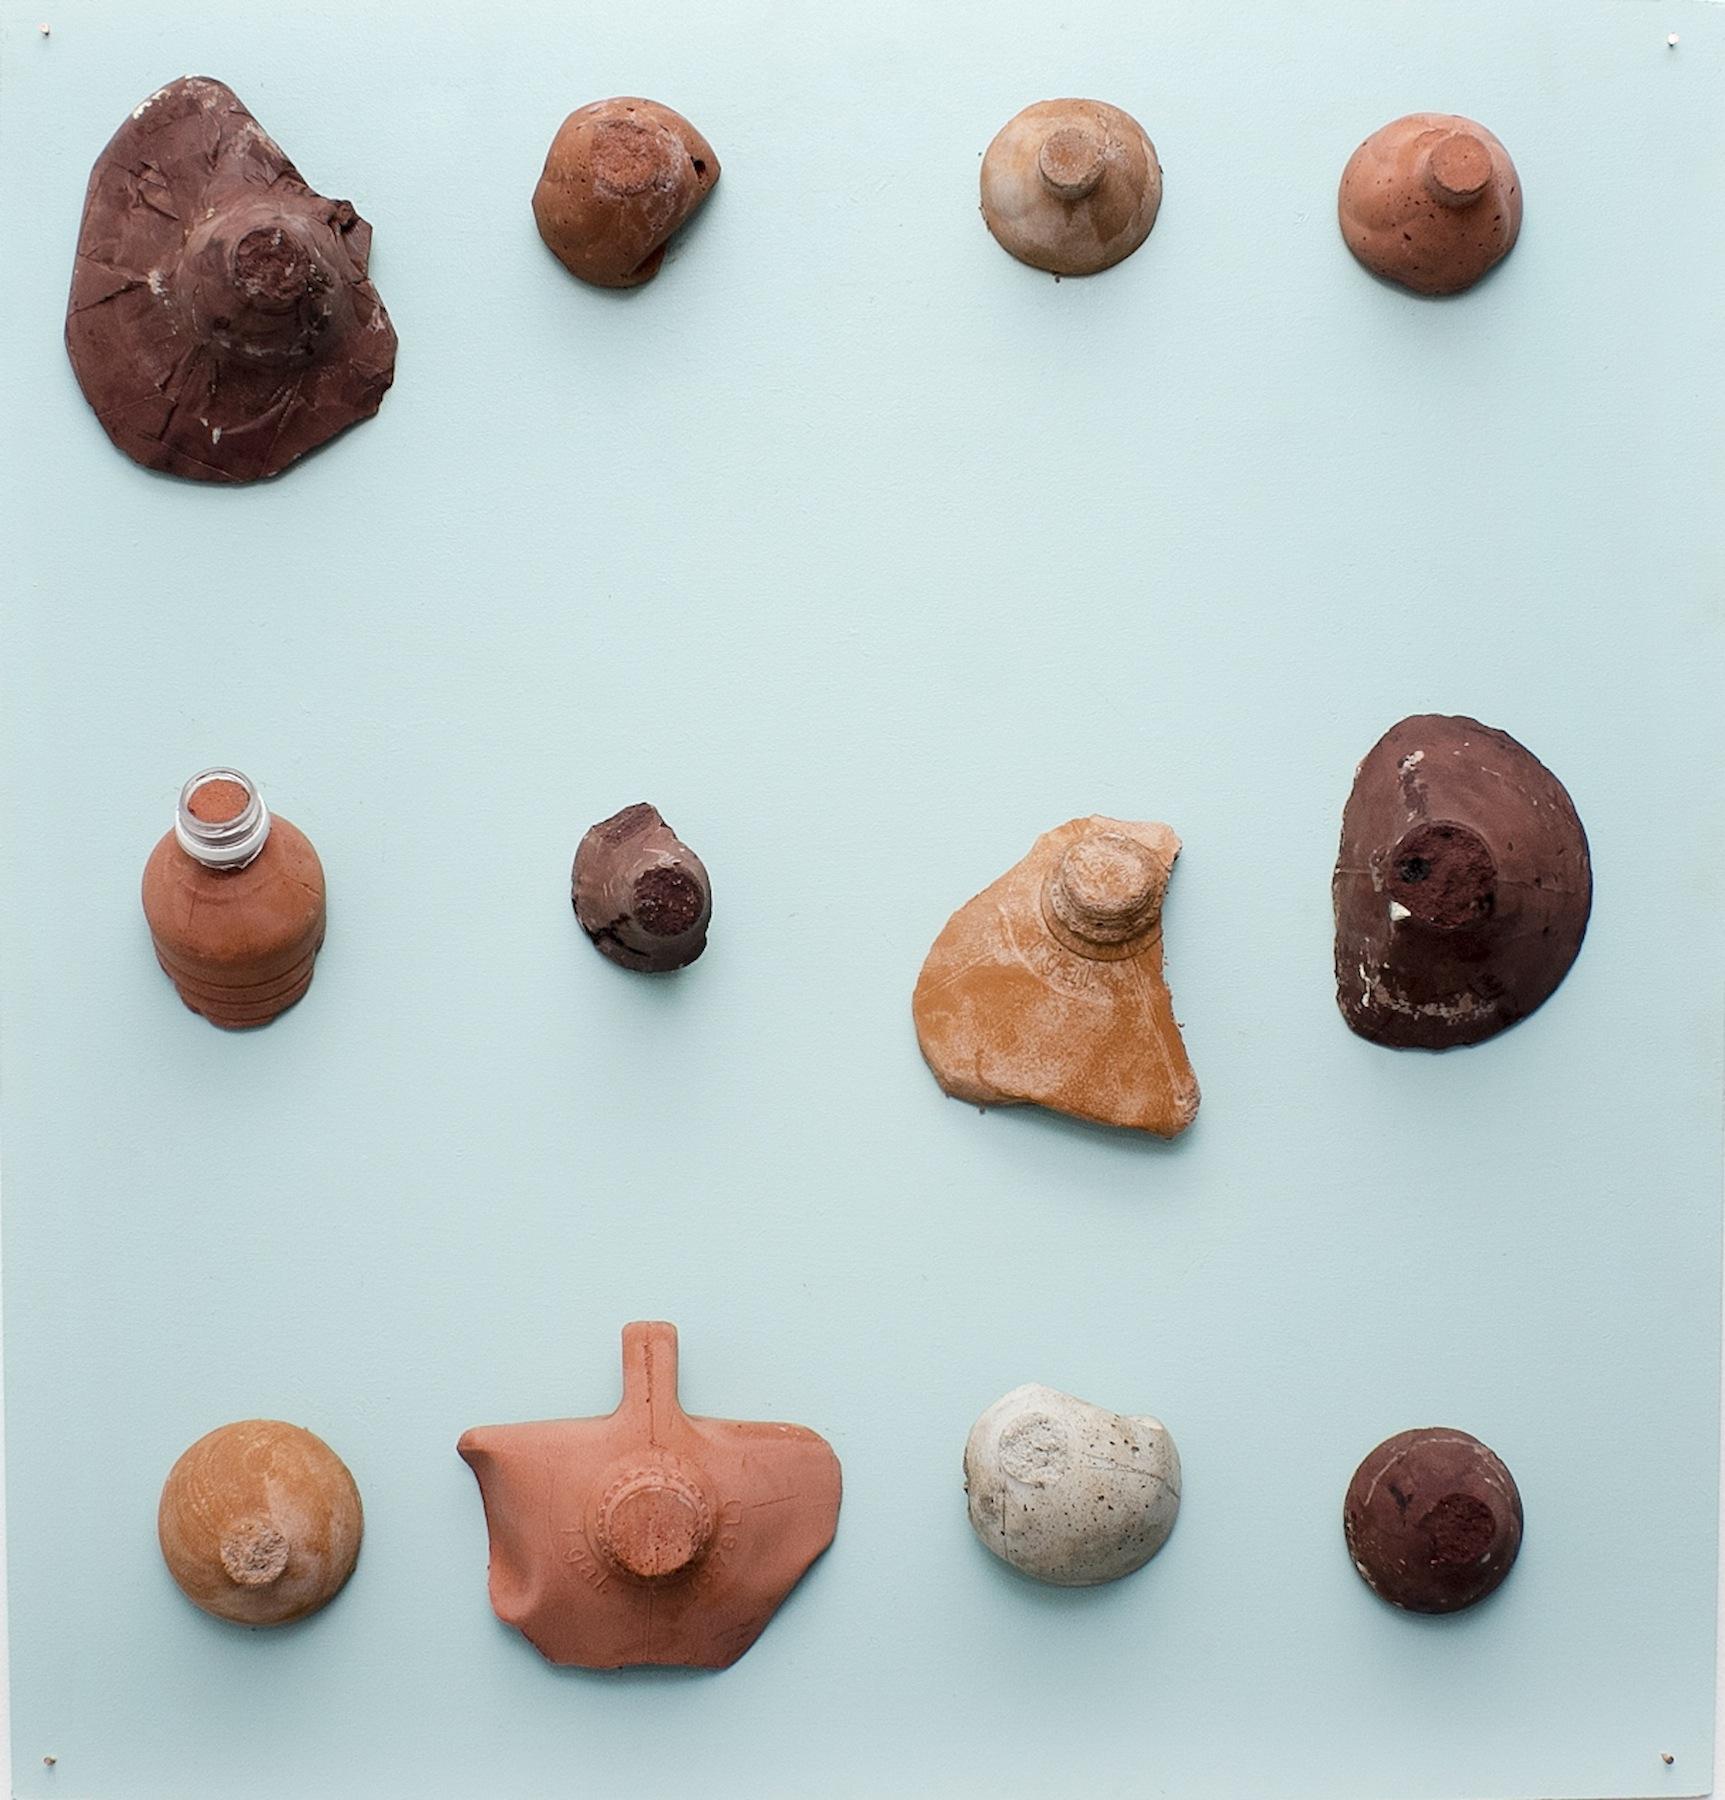 Sarita Westrup. EX VOTOS (BREASTS), 2016. Cement casting. Sizes variable